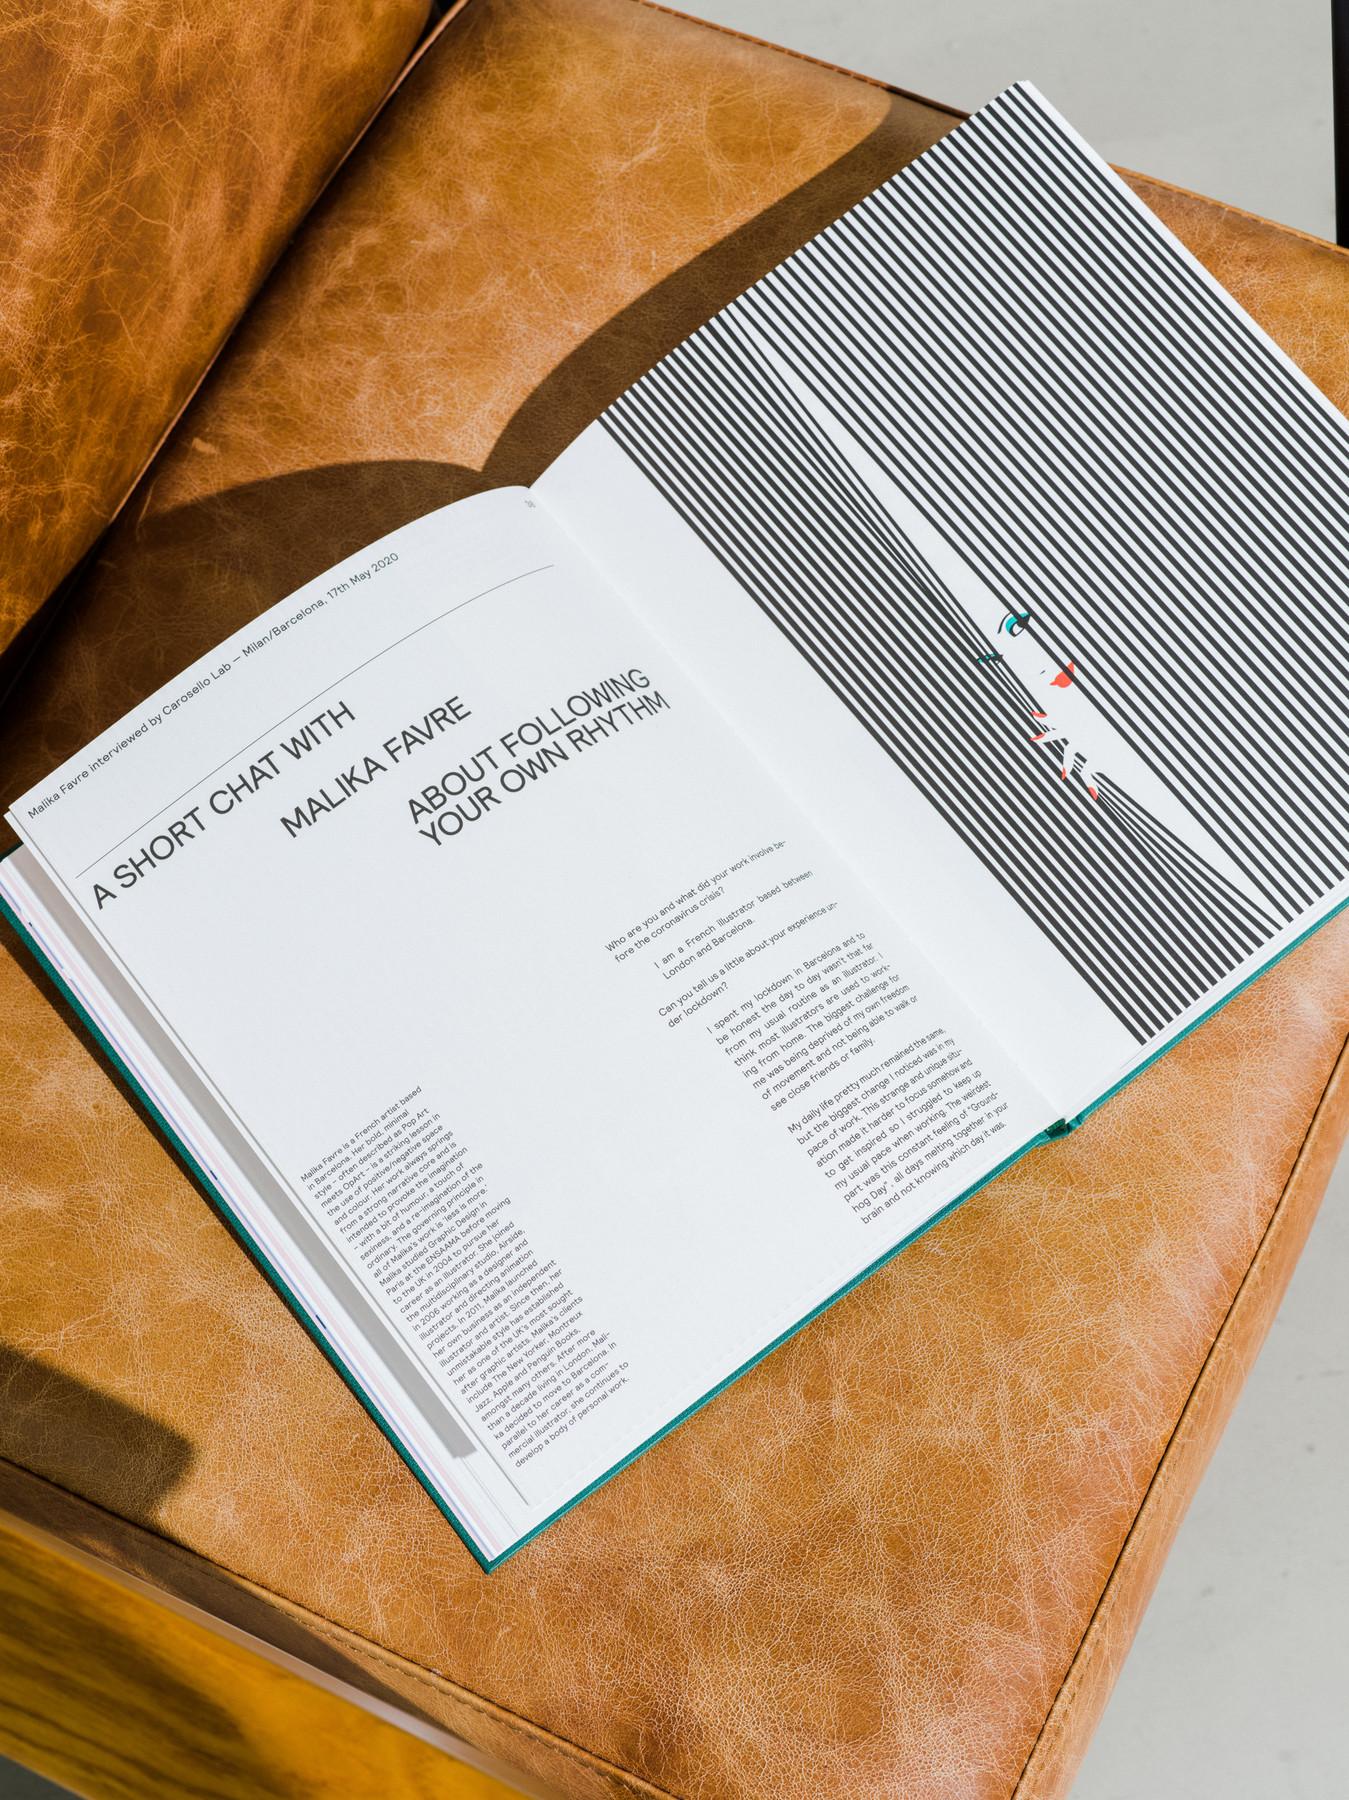 DAC Book CaroselloLab 029